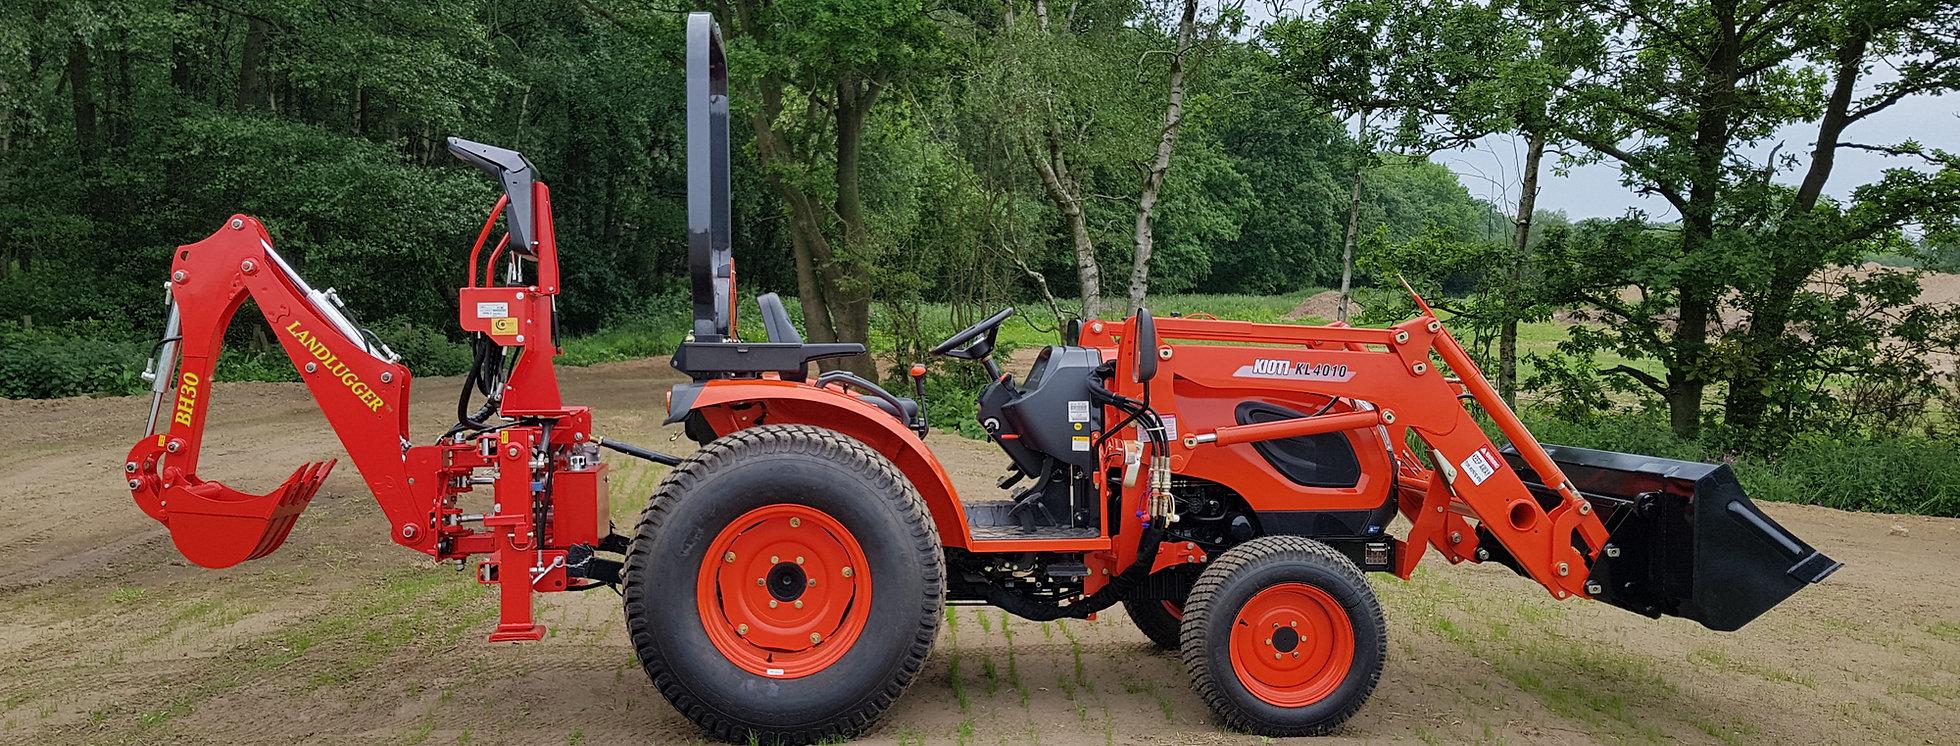 Kioti Tractor CK4010 Loader & Digger   Compact Tractors For Sale UK